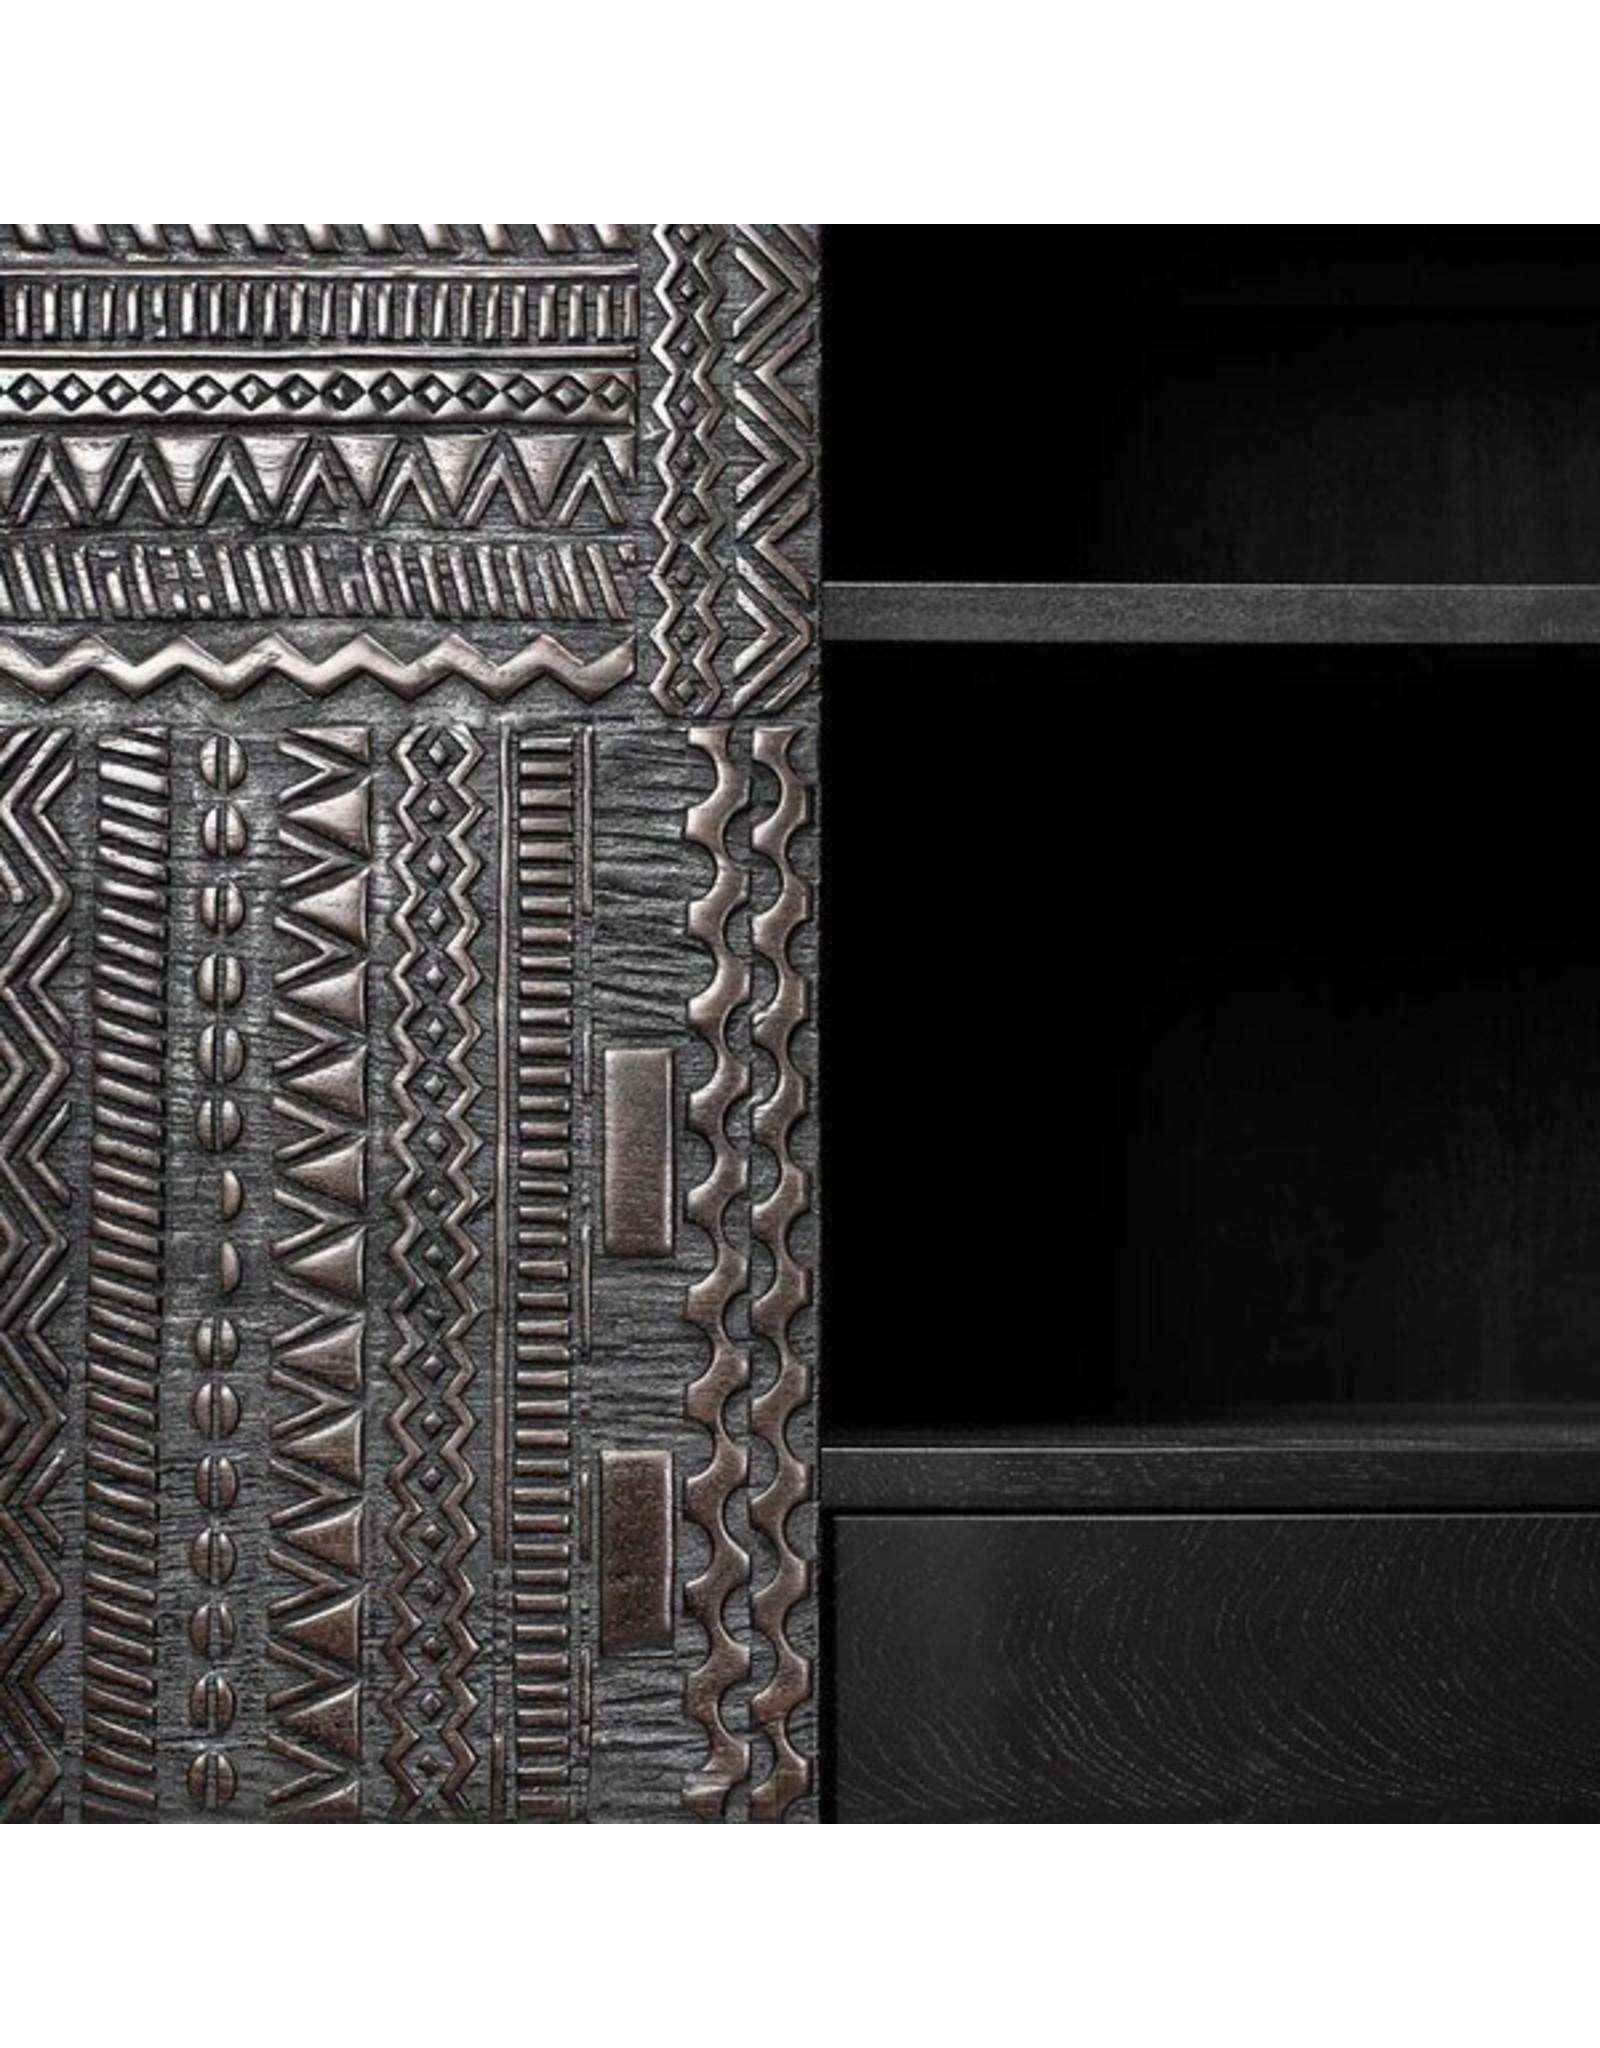 Ethnicraft Teak Tabwa storage cupboard - 2 doors - 2 drawers - Varnished